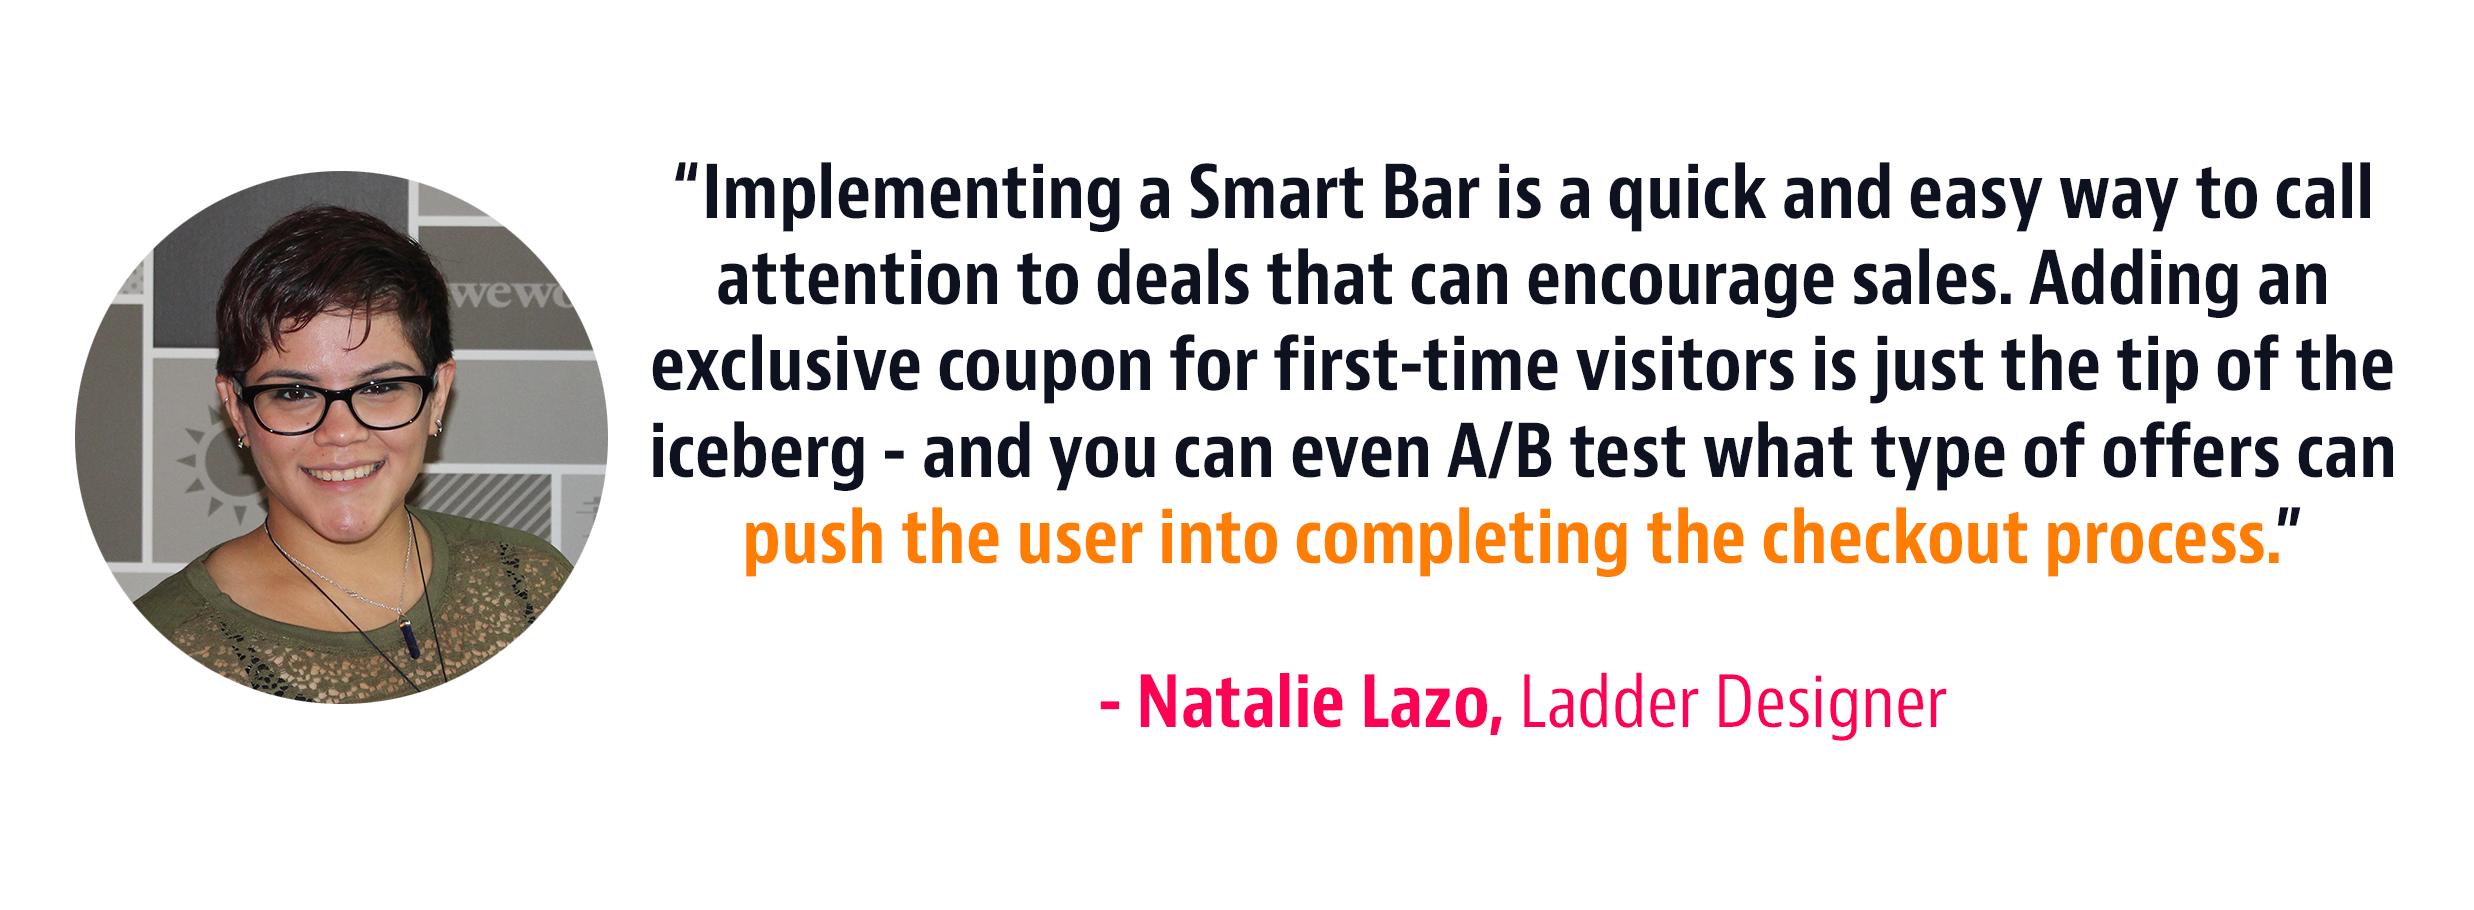 sumome smart bar